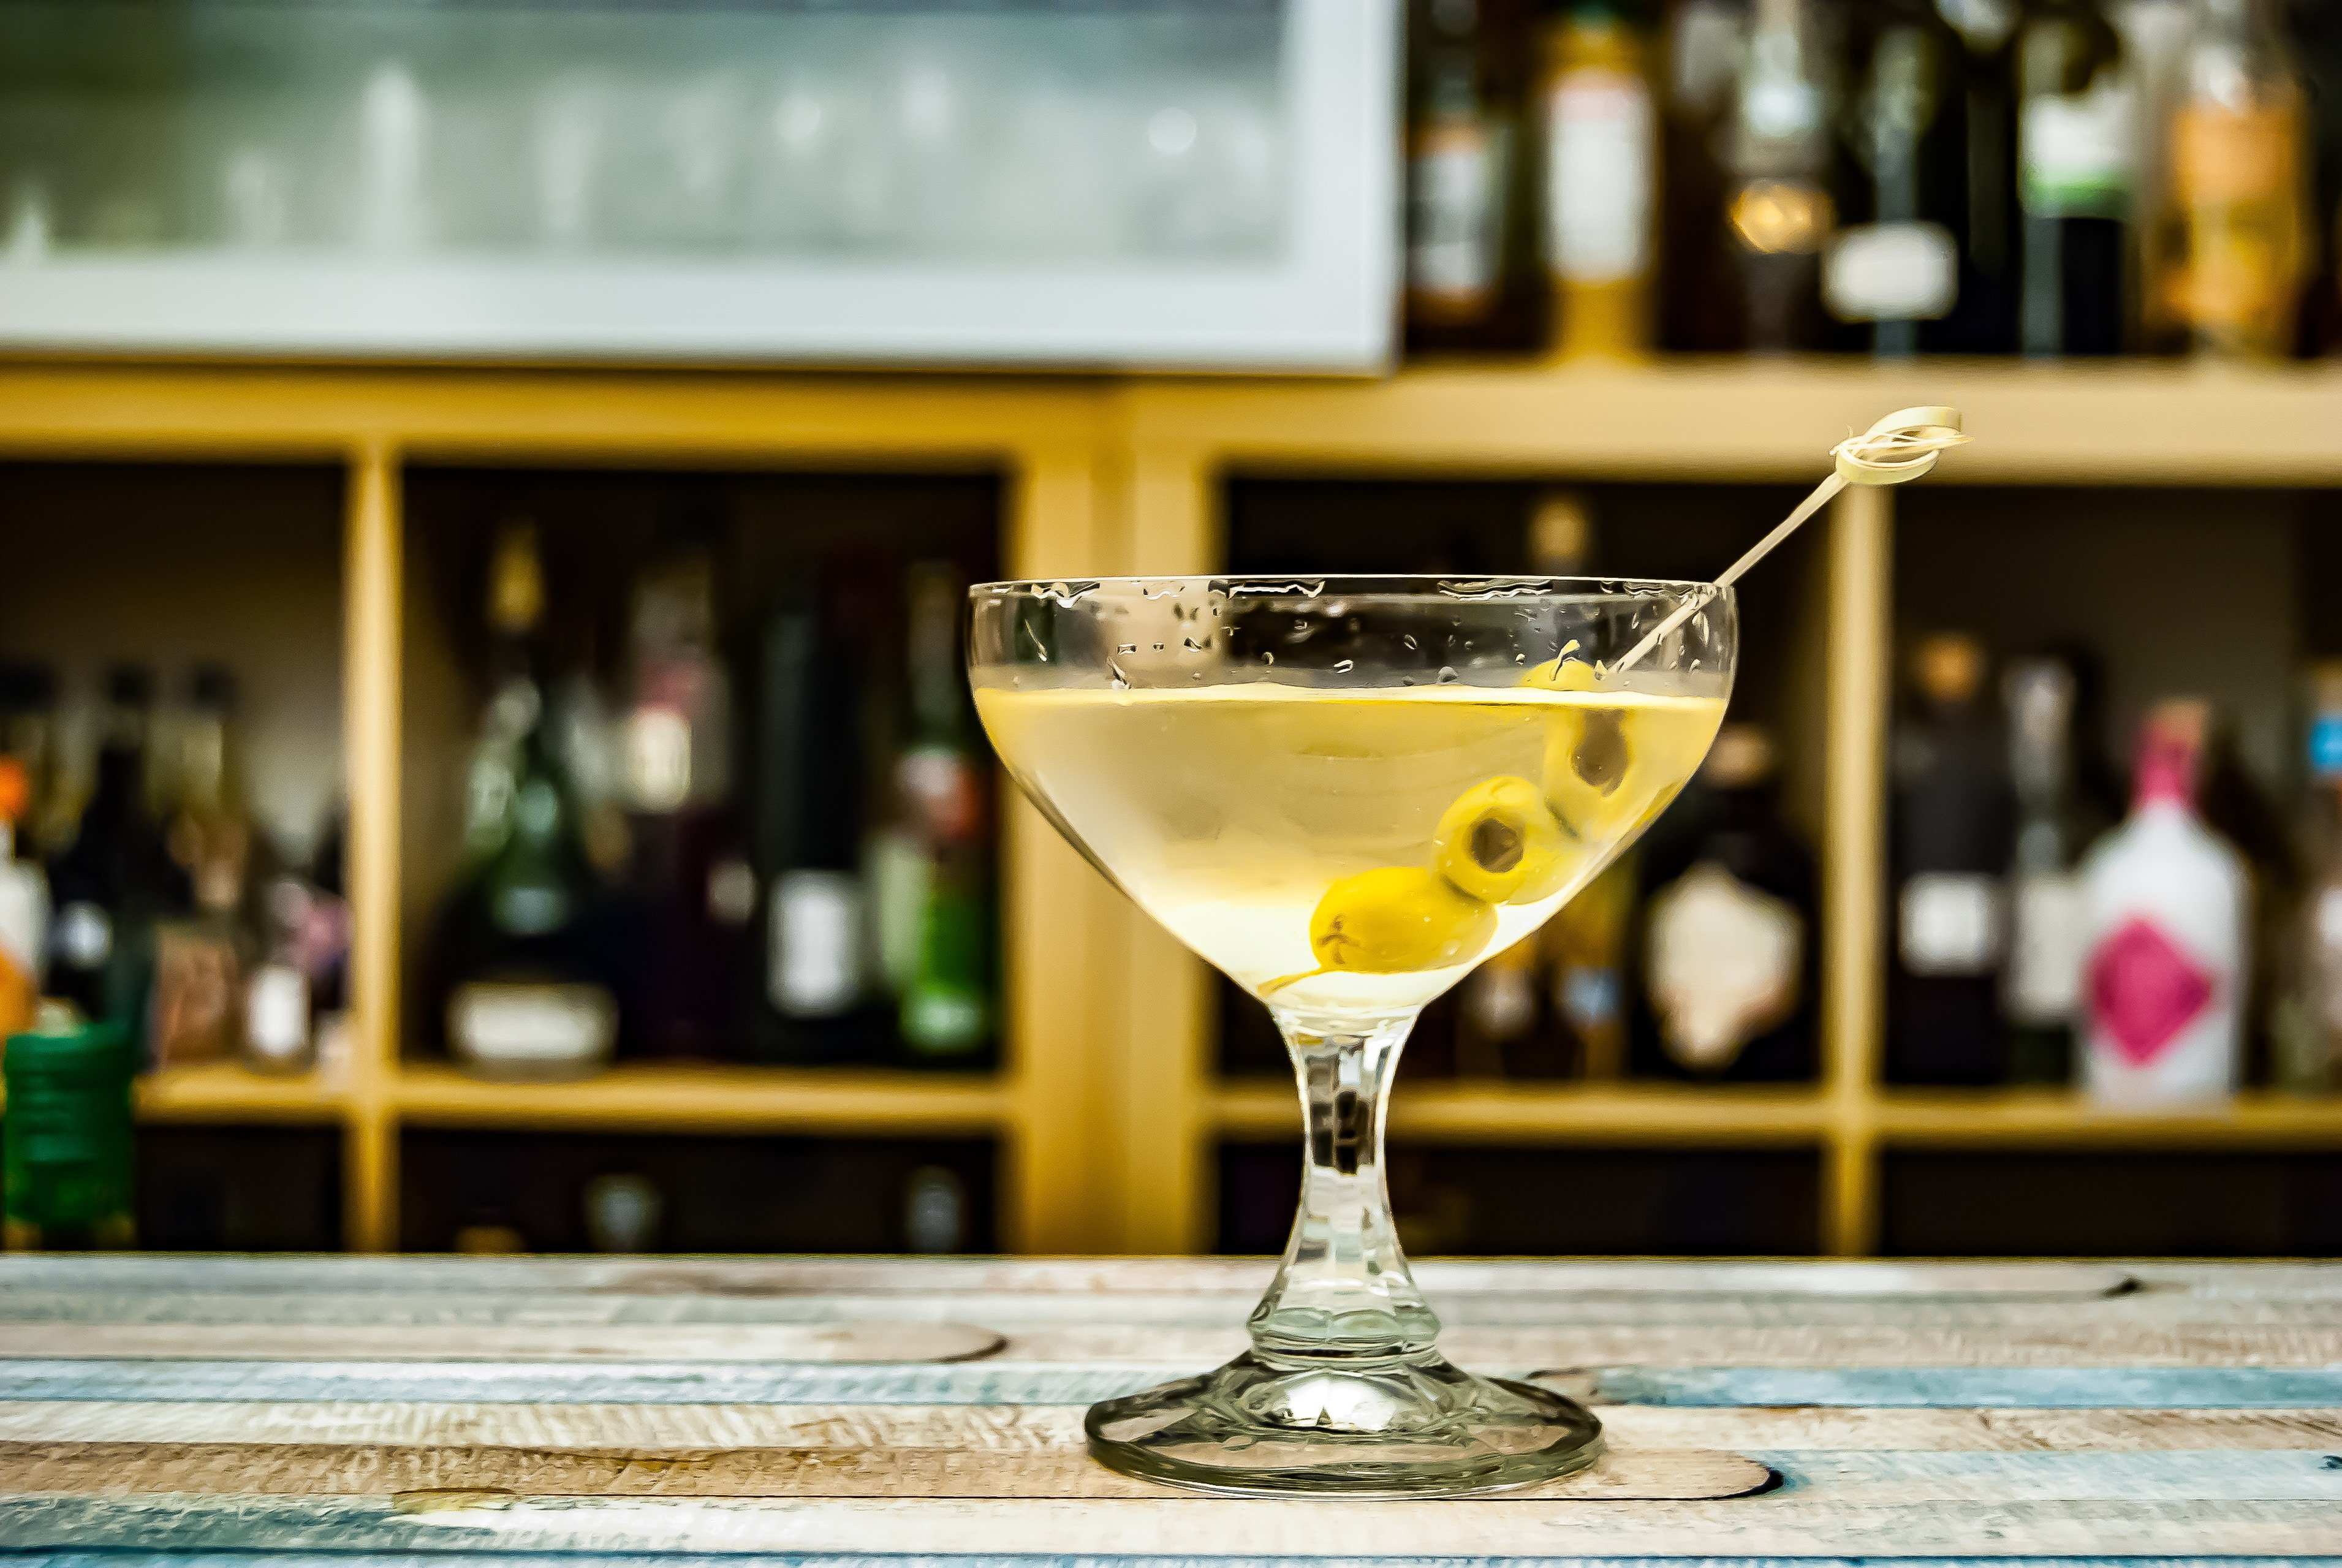 Den klassiske 007 drink - Dry Martini